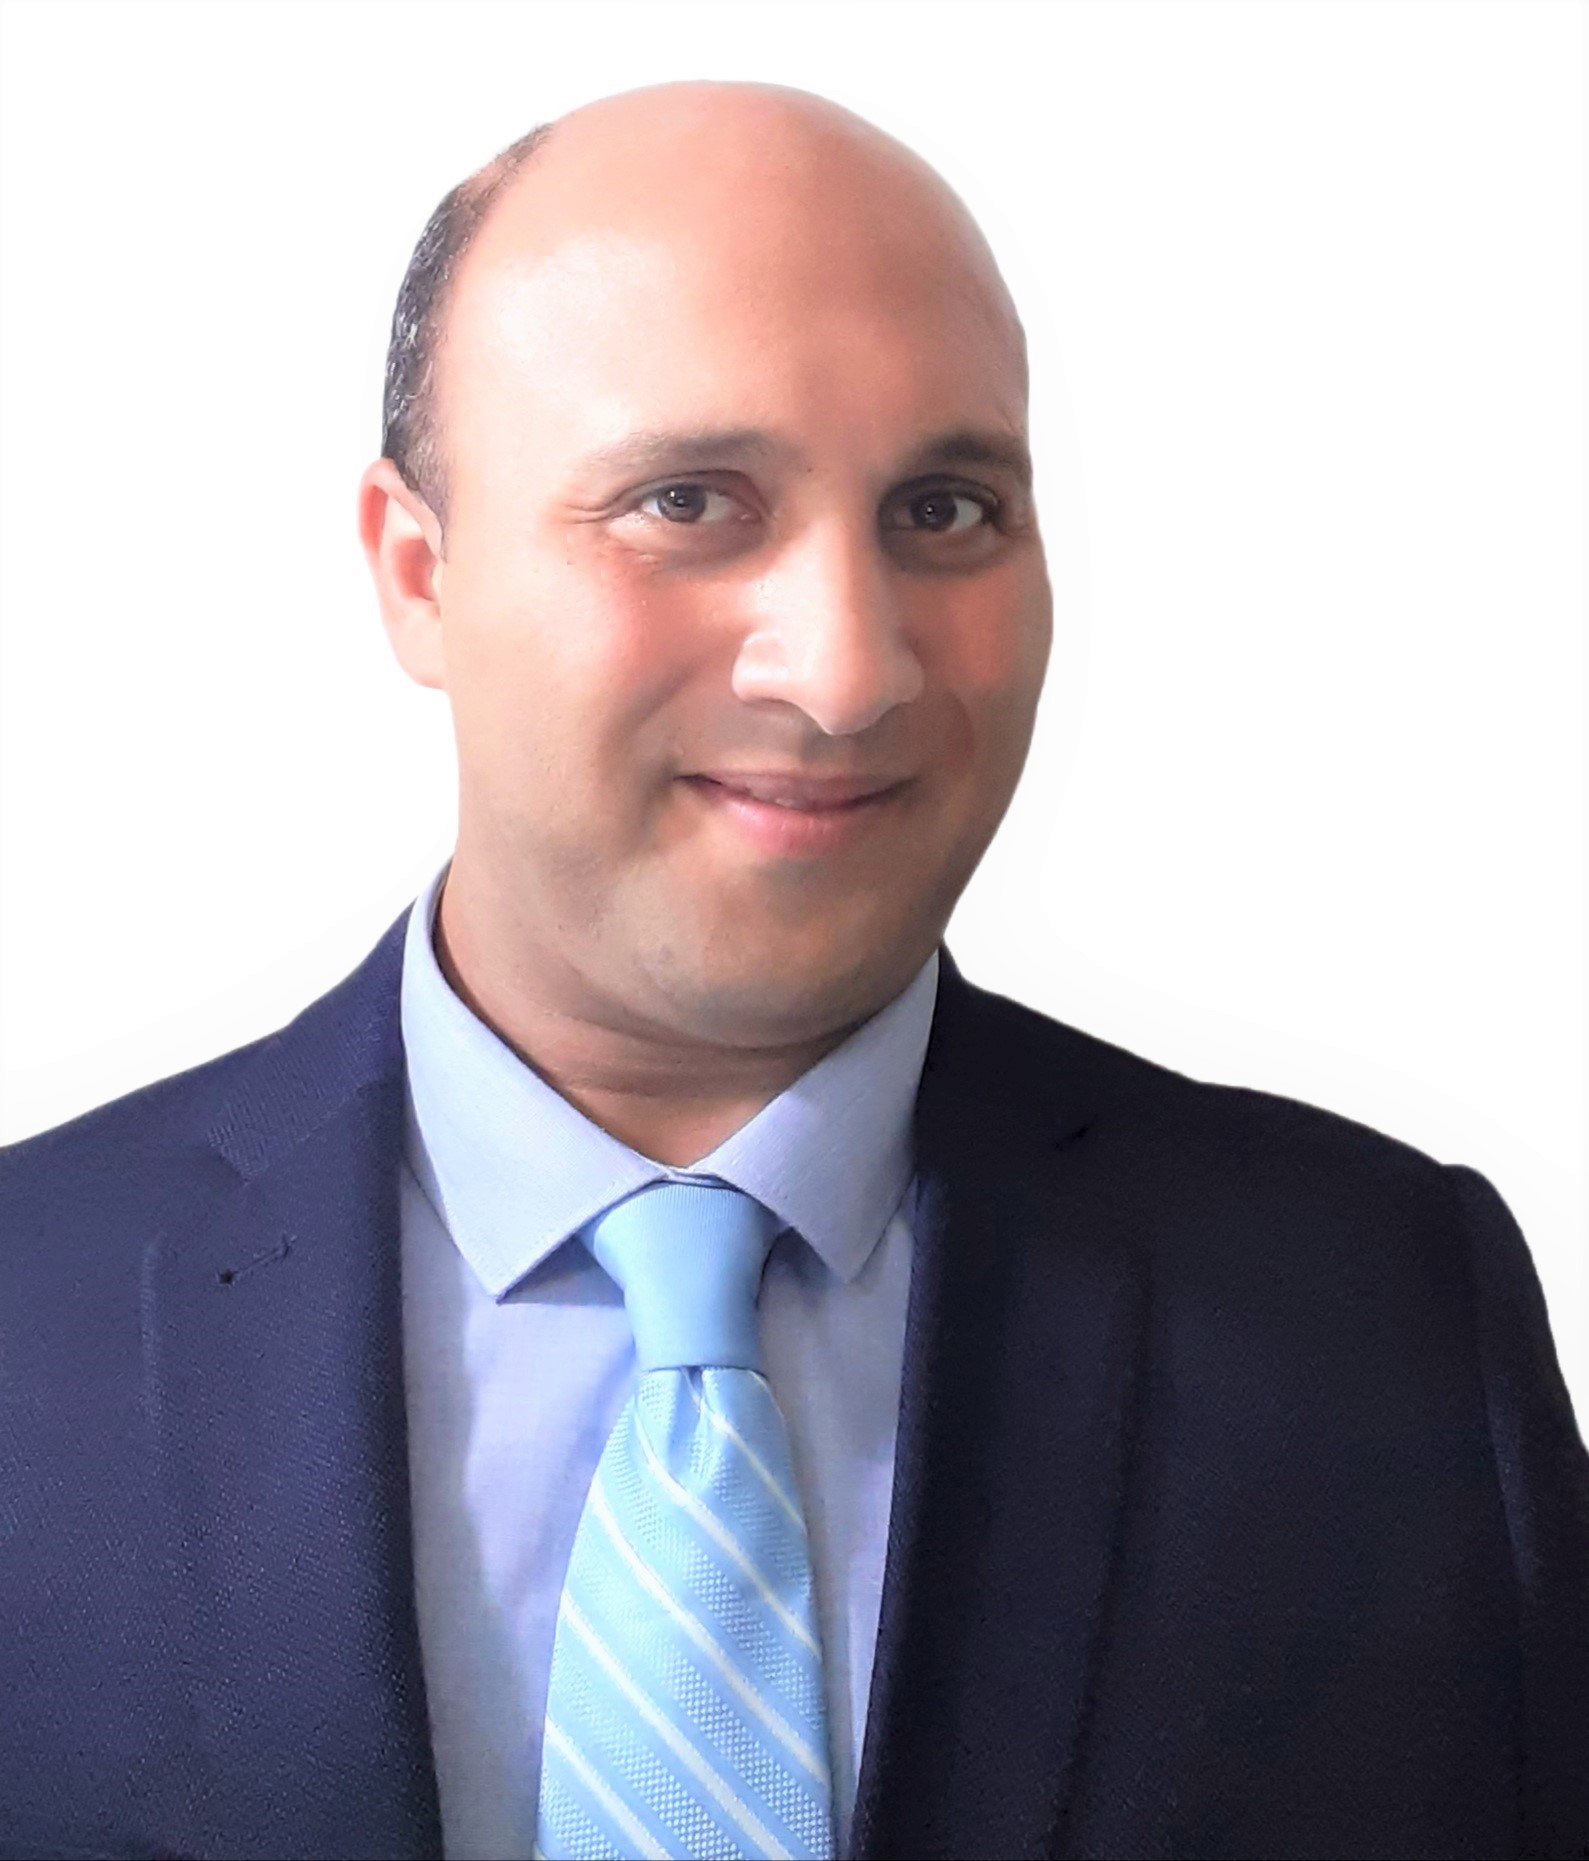 Mohammed Ata, PT, DPT, PhD, C/NDT